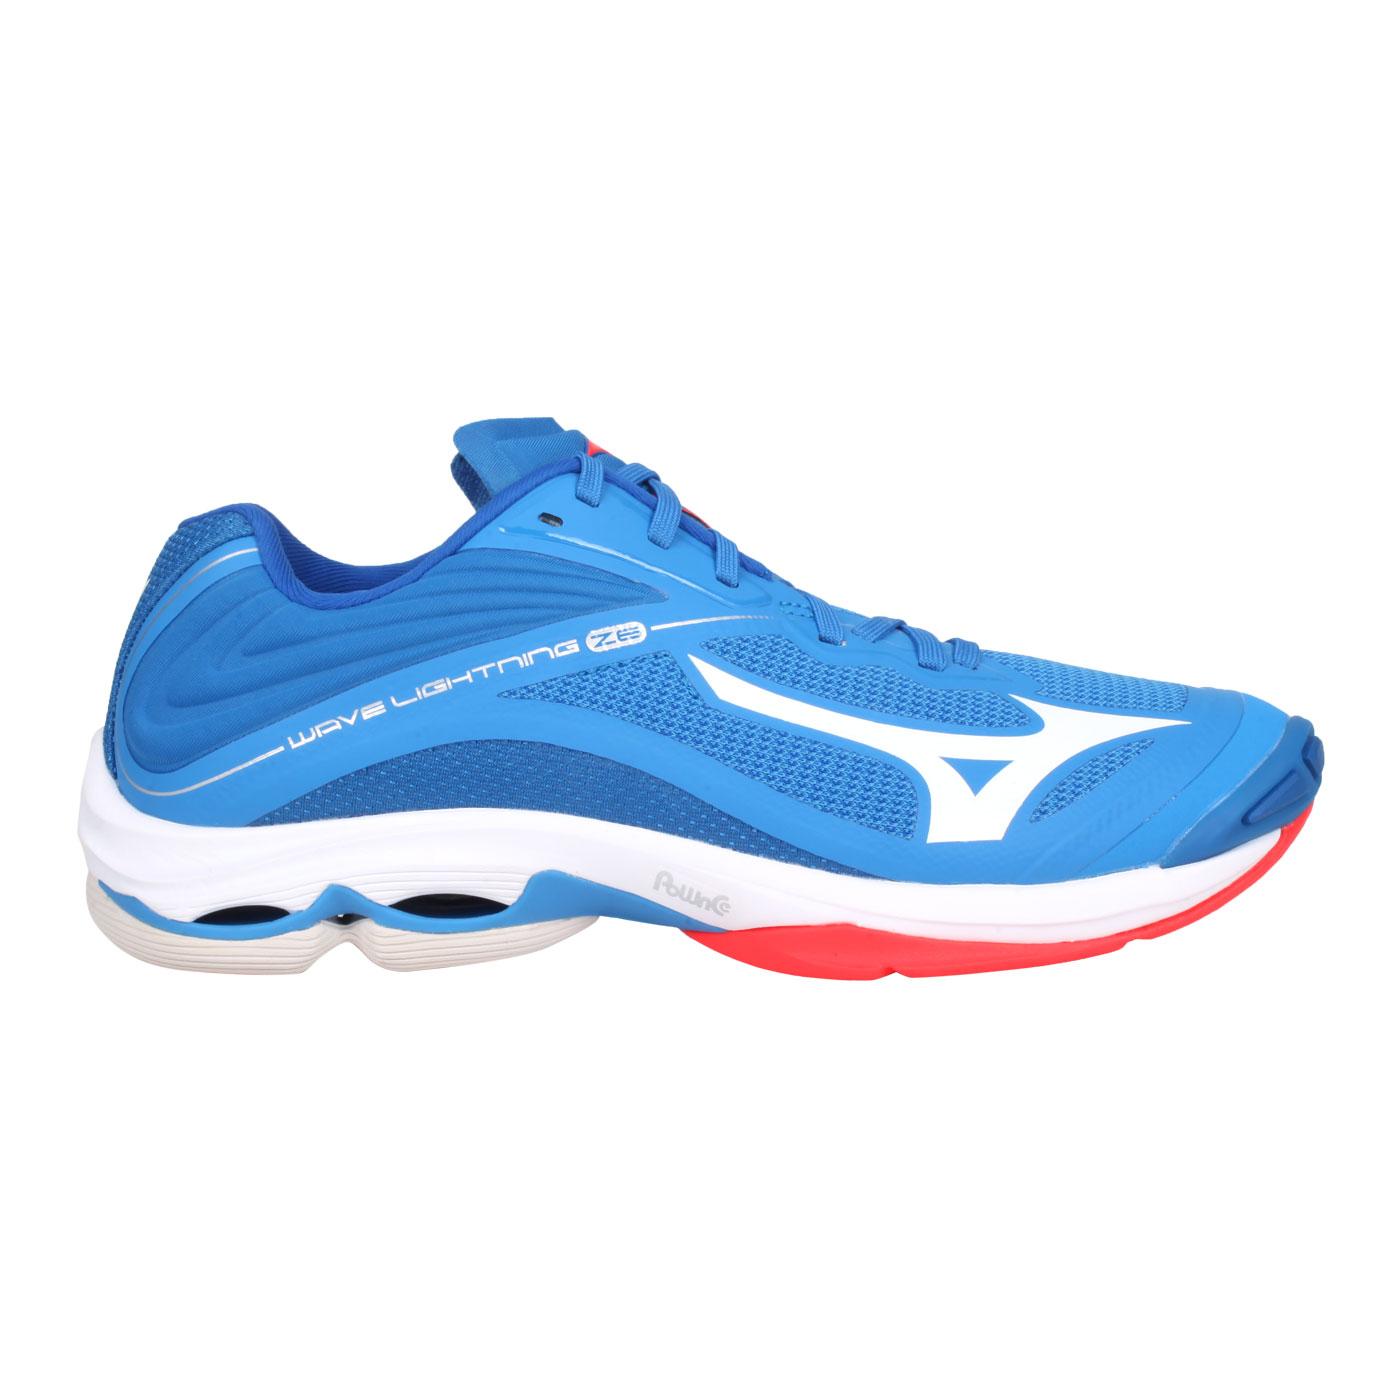 MIZUNO 排球鞋  @WAVE LIGHTNING Z6@V1GA200024 - 藍白紅